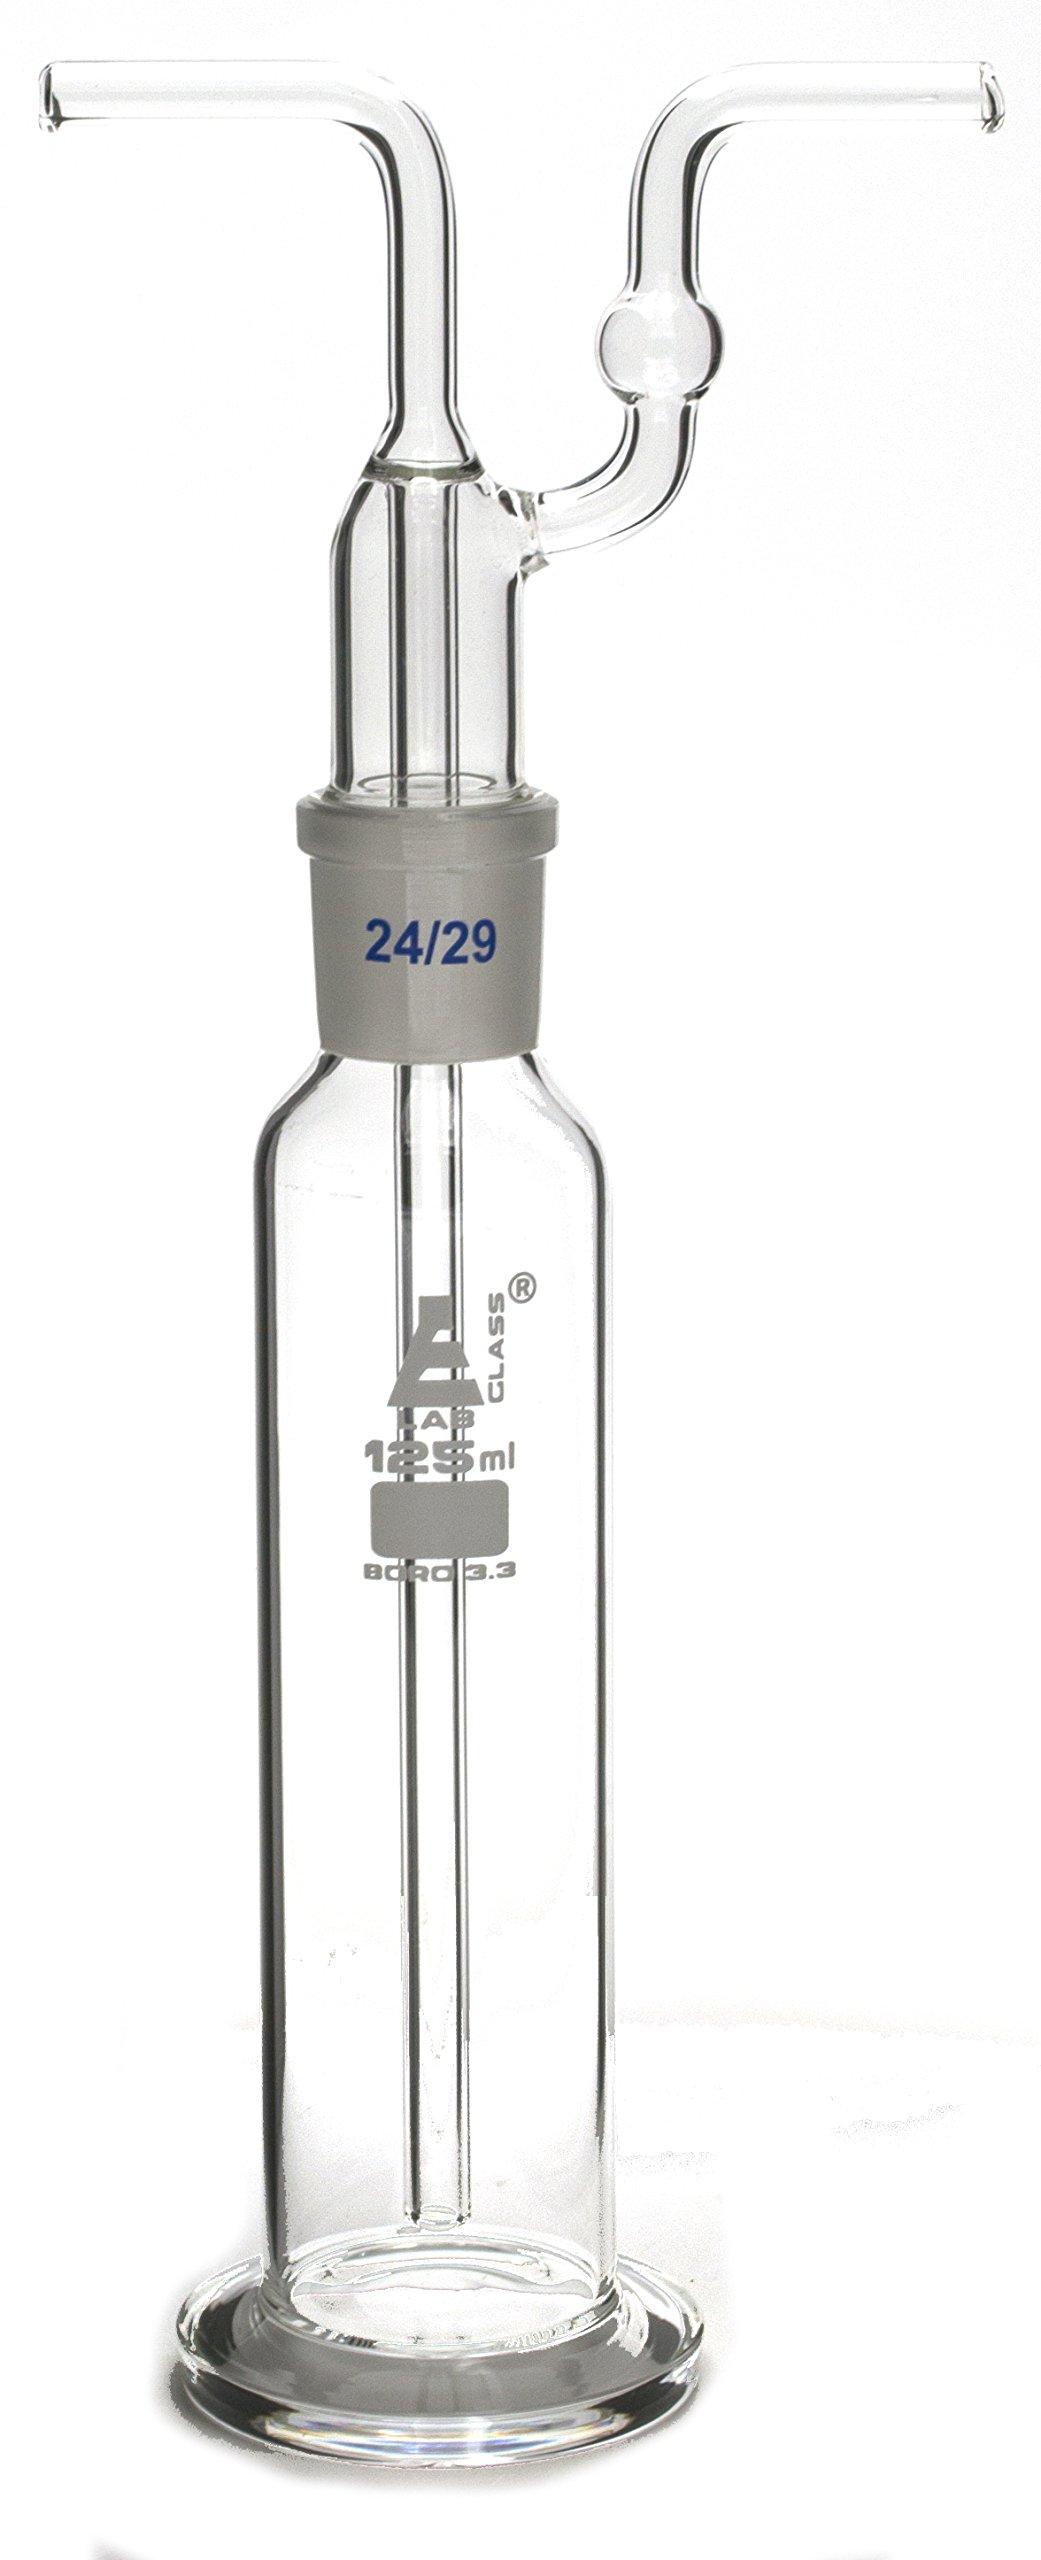 125mL Drecshel's Bottle for Gas Washing, Interchangeable Joint Head 24/29, Borosilicate 3.3 Glass - Eisco Labs